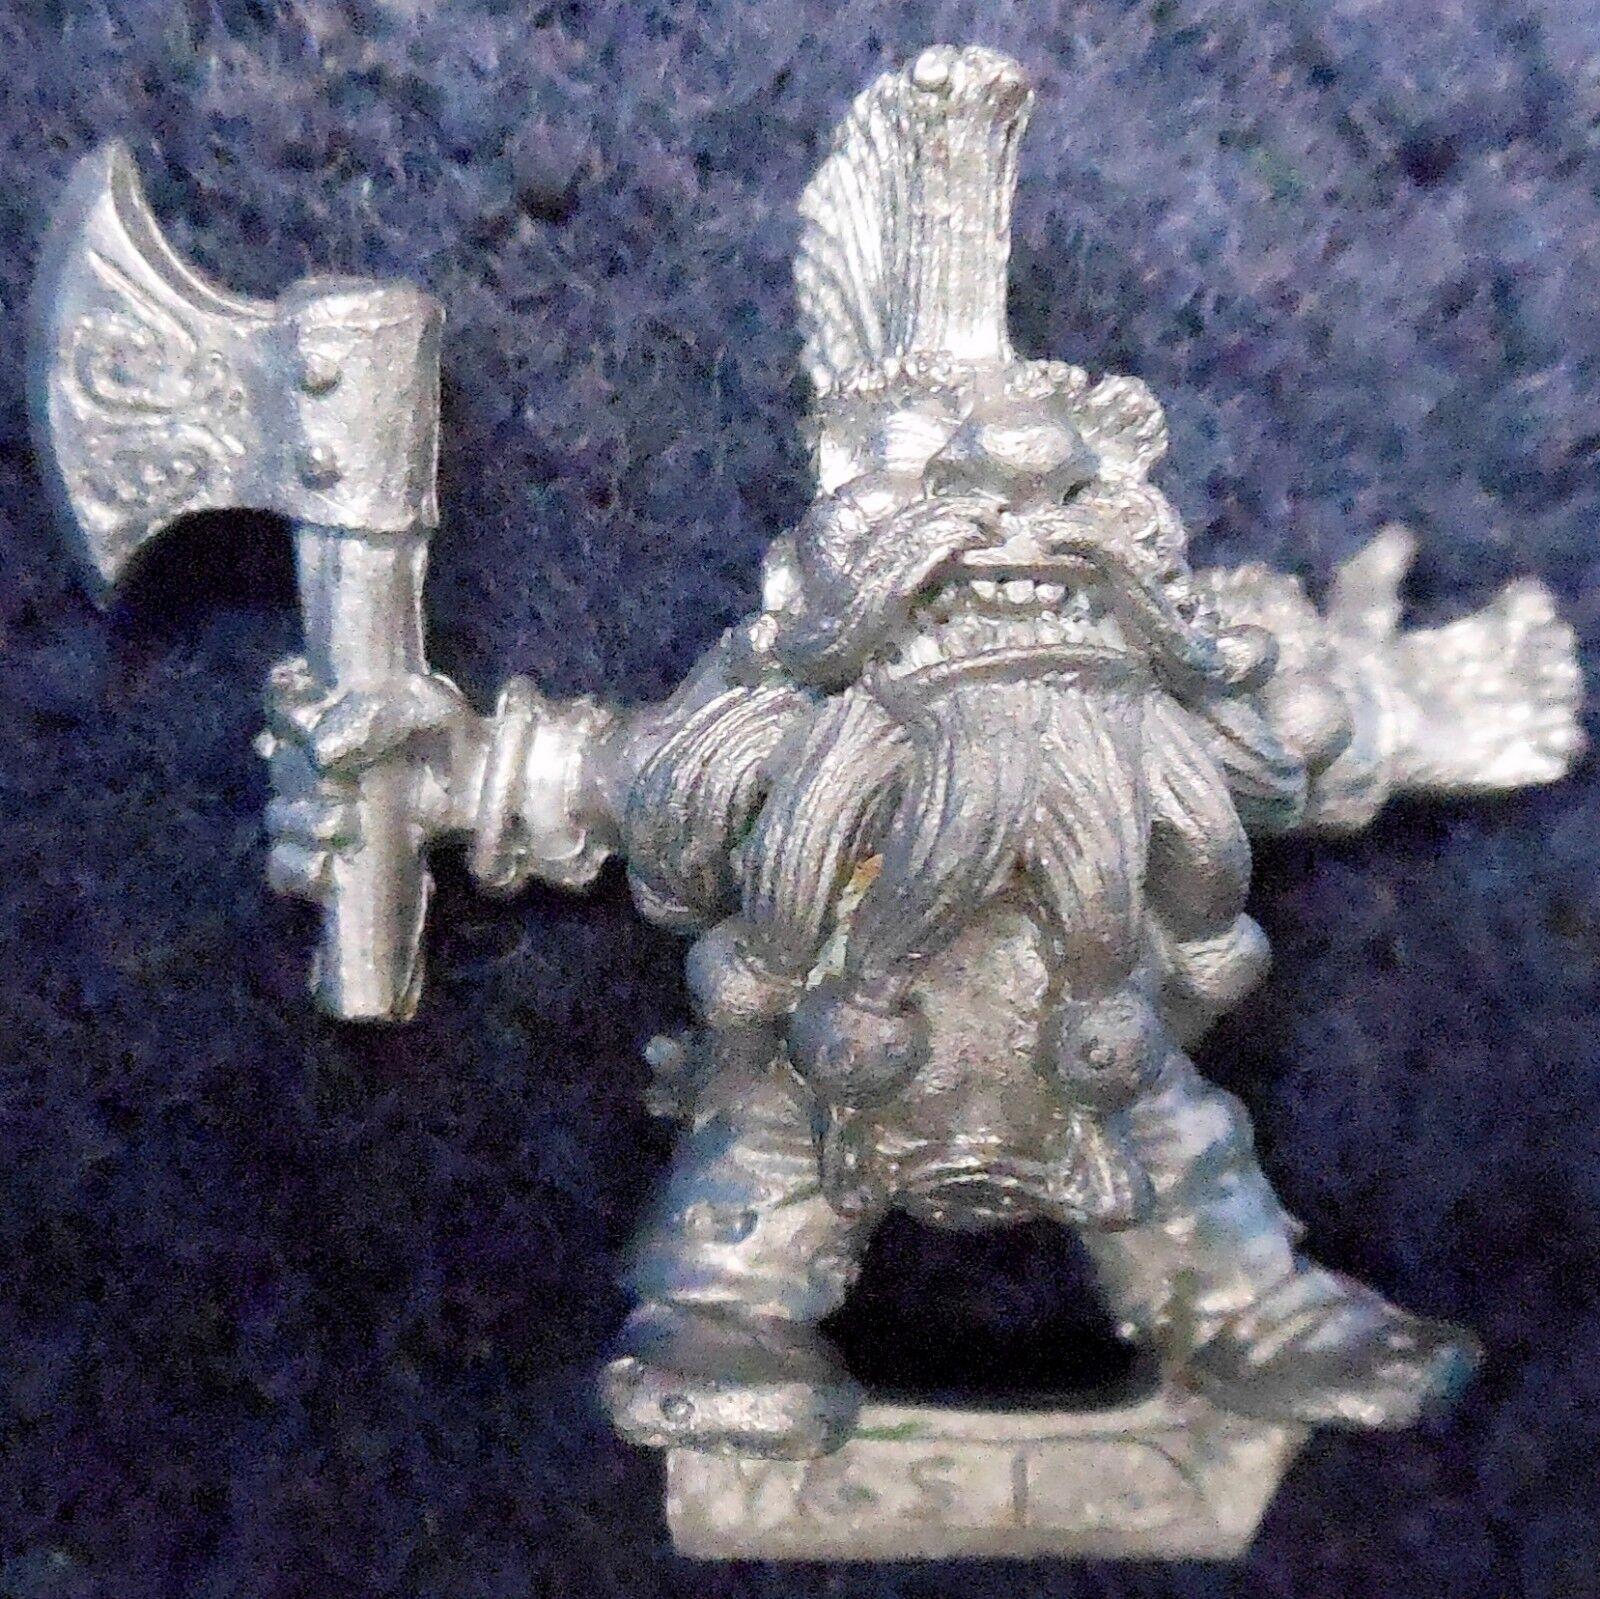 1992 Marauder Dwarf Giant Slayer GS1 Open Hand Variant Citadel Warhammer MM16 GW